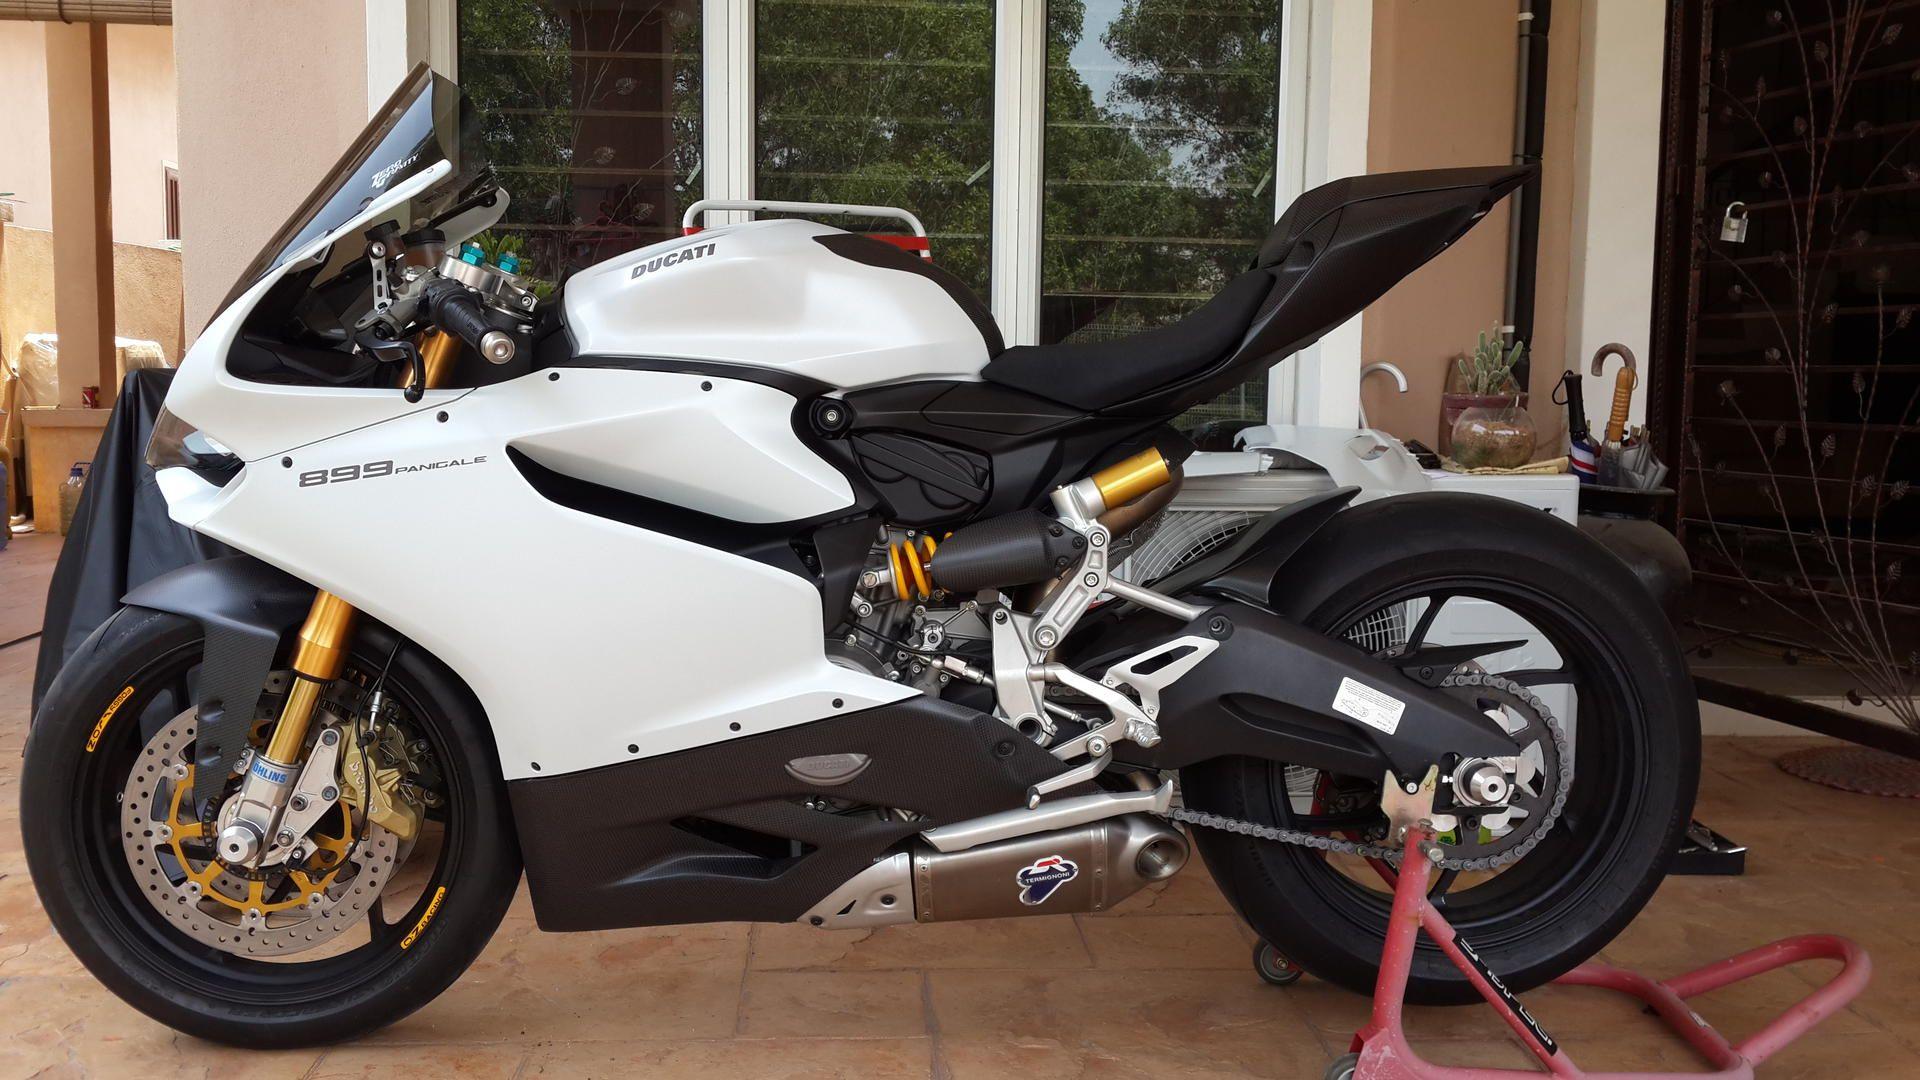 ducati 899 panigale white bike | custom motorcycles & classic